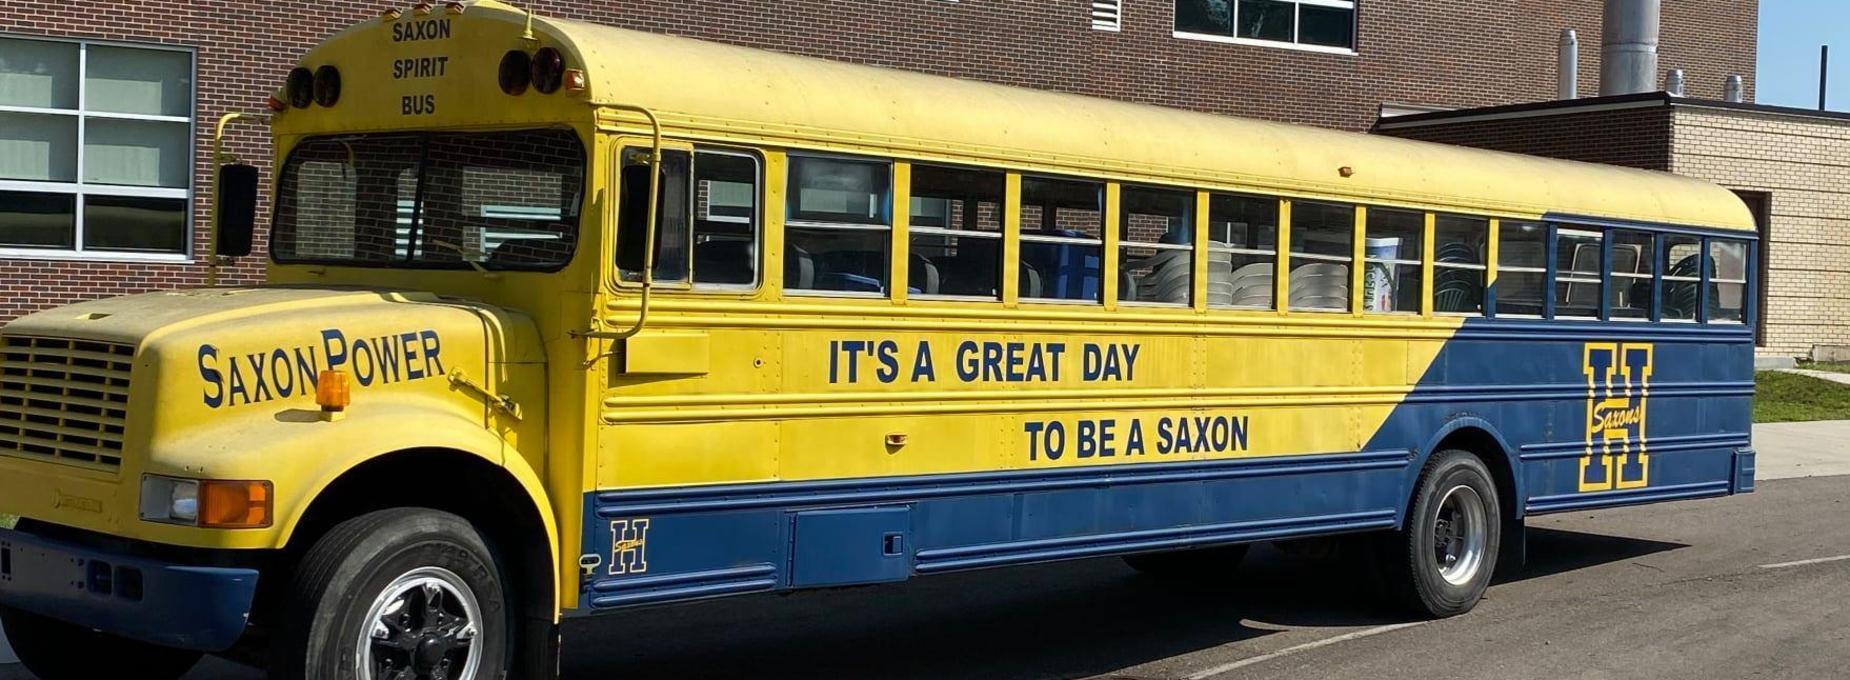 Spirit Bus